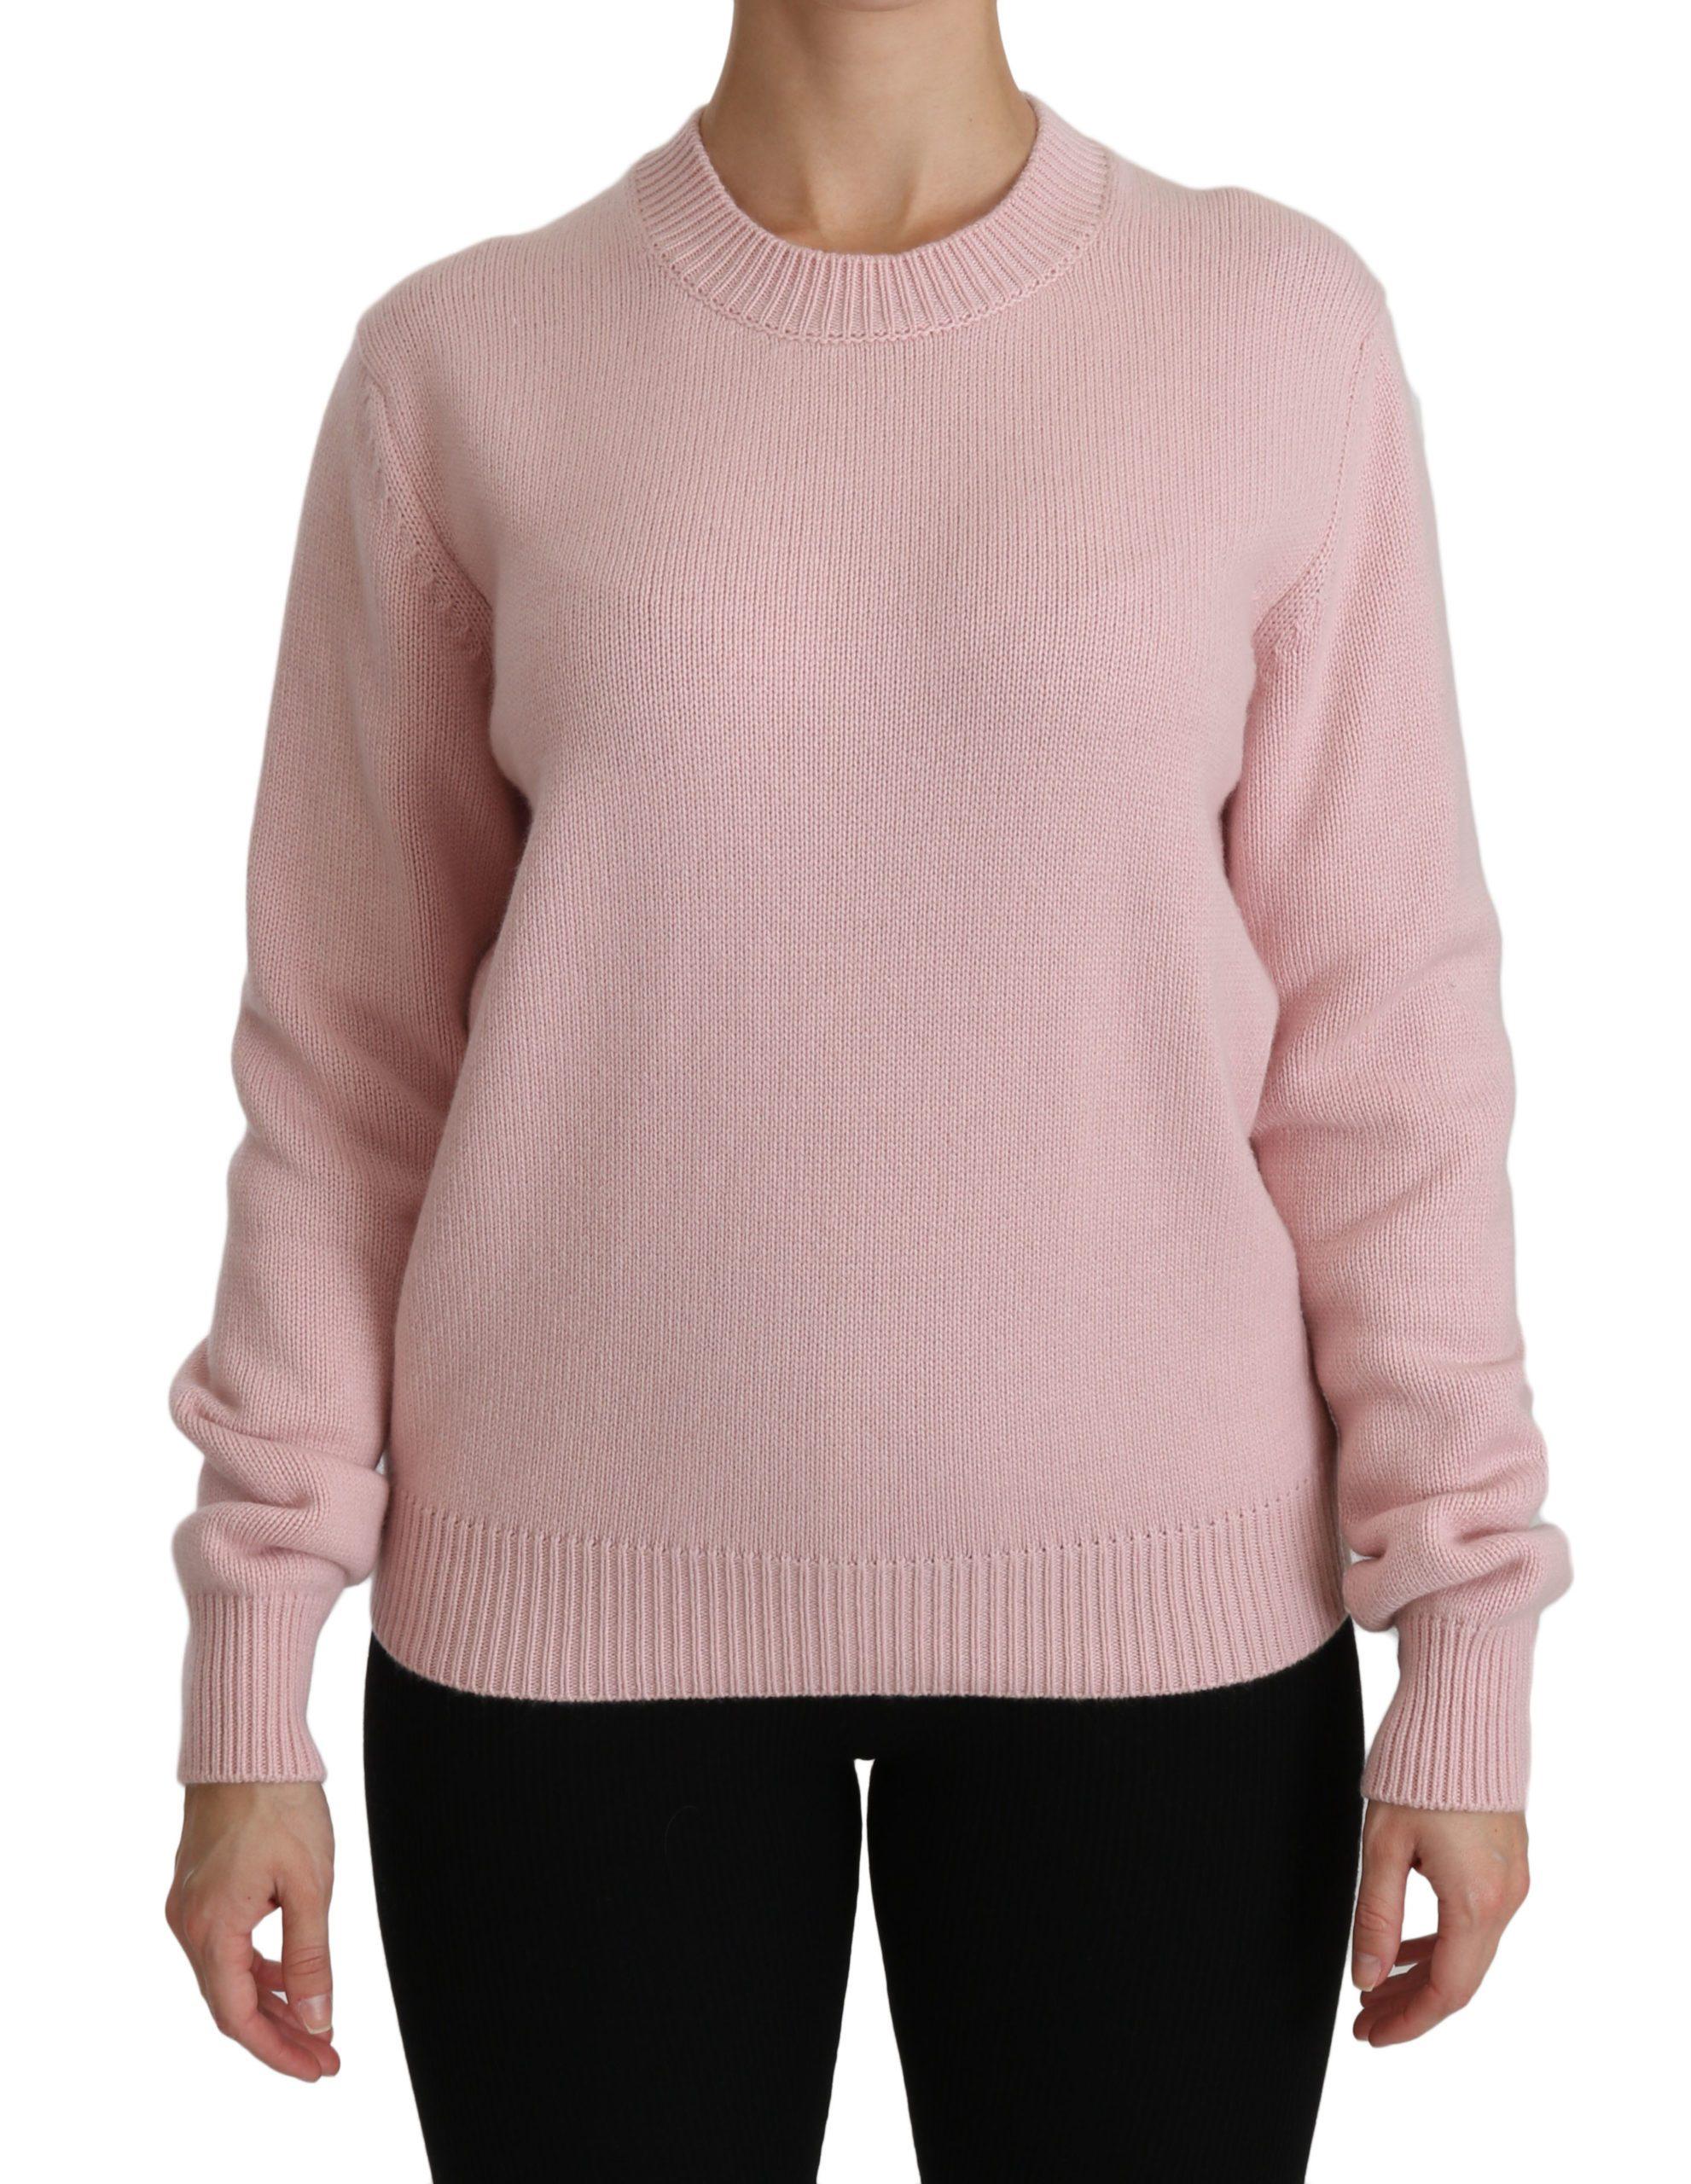 Dolce & Gabbana Women's Crew Neck Cashmere Pullover Sweater Pink TSH4236 - IT40|S